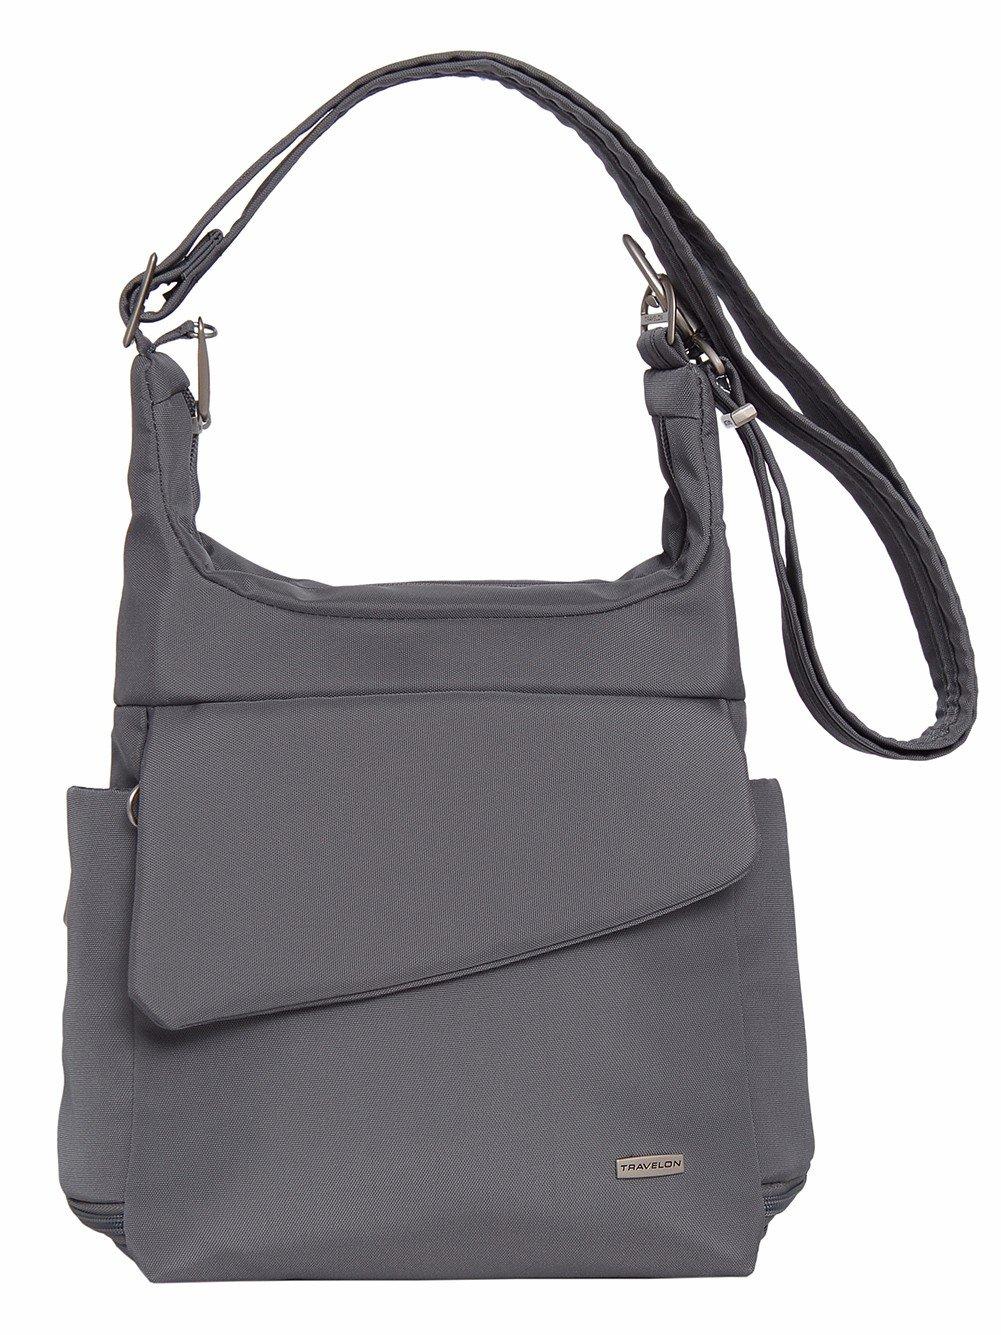 Travelon Anti-Theft Classic Messenger Bag, Black, One Size 42242-Black-One Size